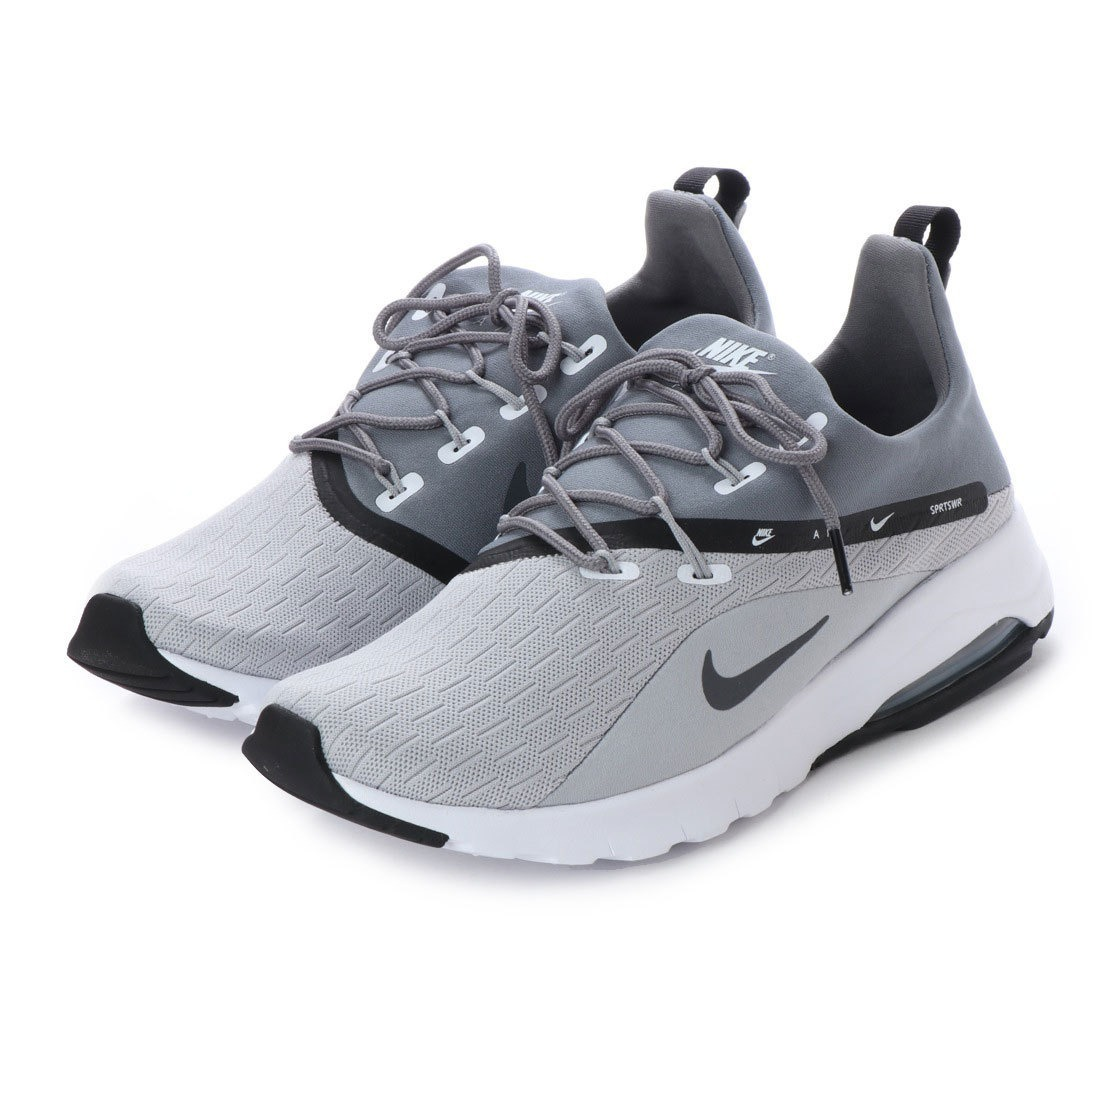 5ff9fa626d2c tenis nike men s air max motion racer 2 running shoe. Cargando zoom.